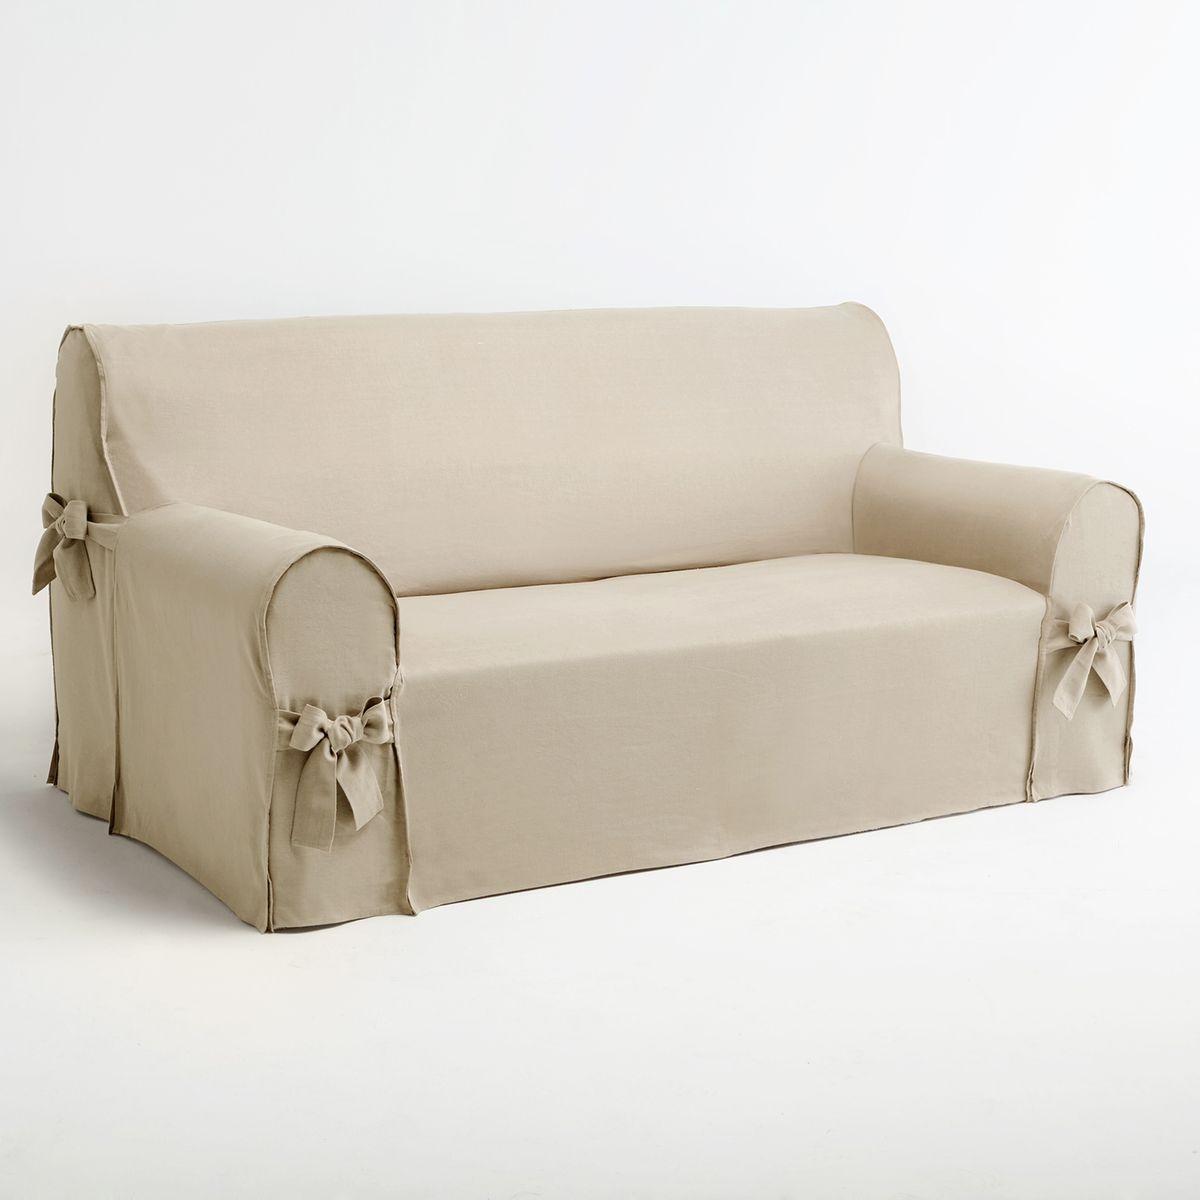 prix des housse canap. Black Bedroom Furniture Sets. Home Design Ideas